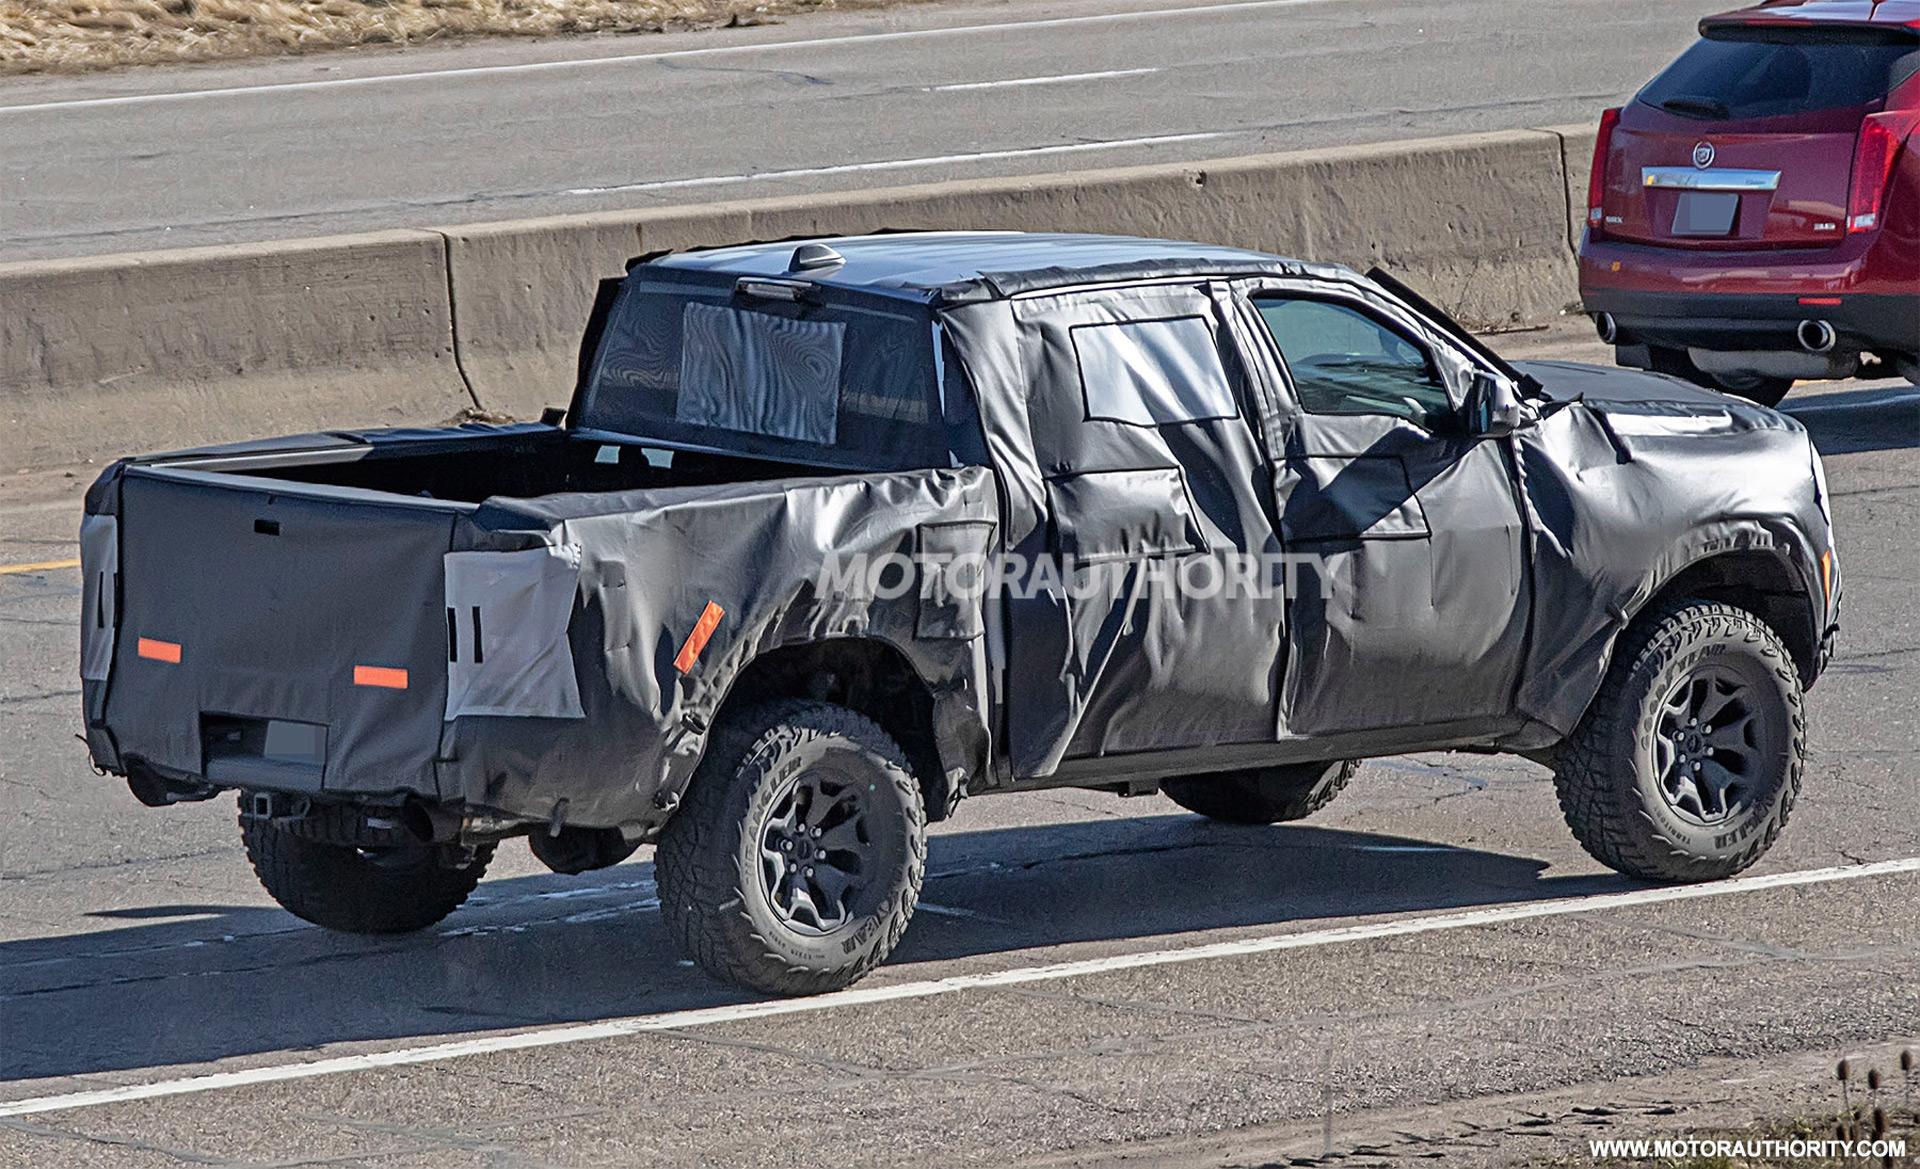 2021 Chevrolet Camaro, 2022 Ram Rebel TRX, Twin-turbo C8 Chevy Corvette: The Week In Reverse